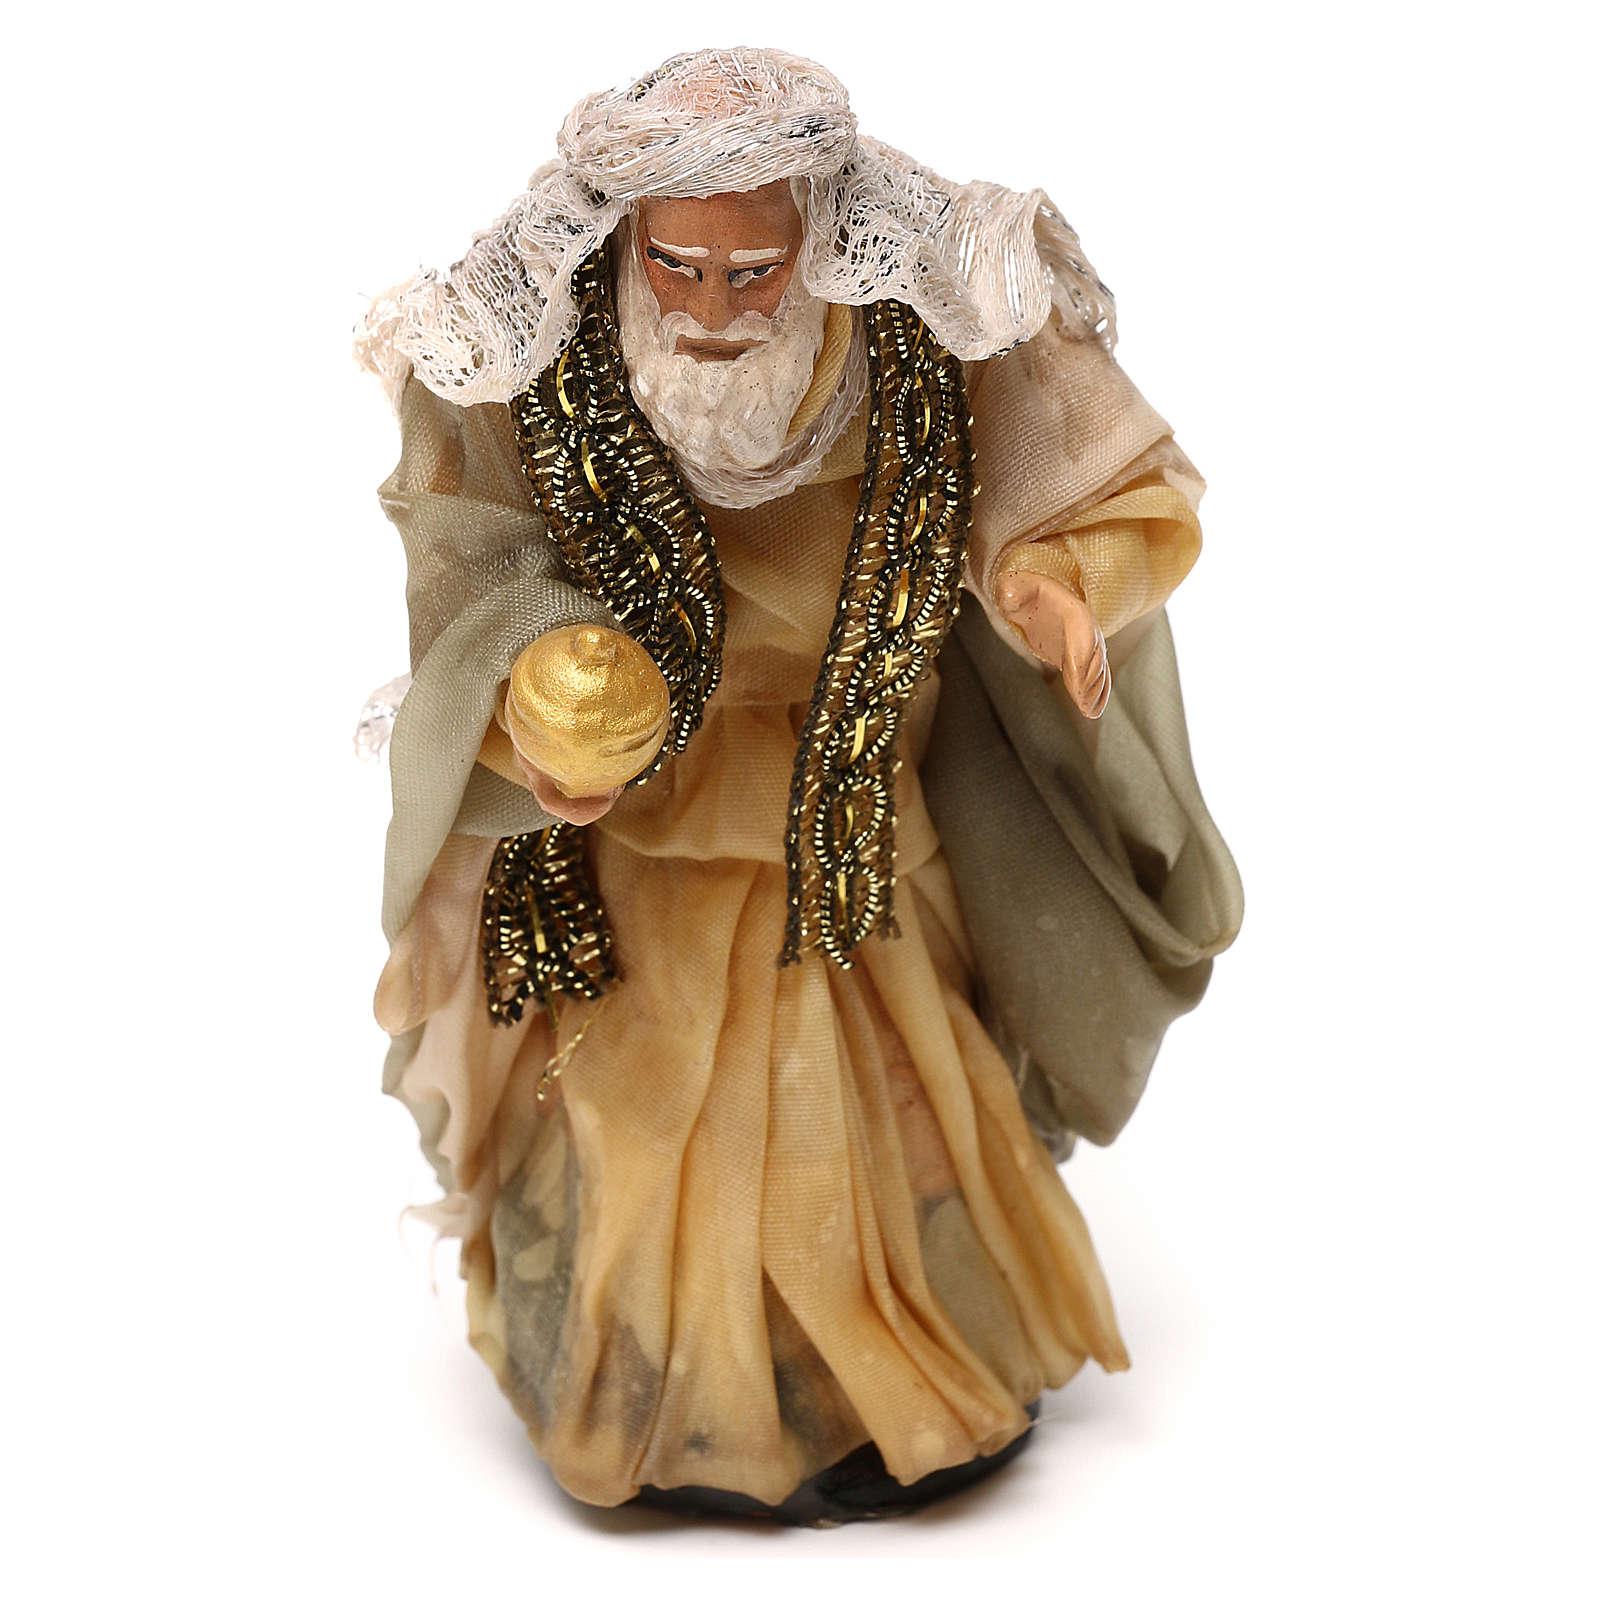 Neapolitan Nativity scene, Magi King with white beard 12 cm 4